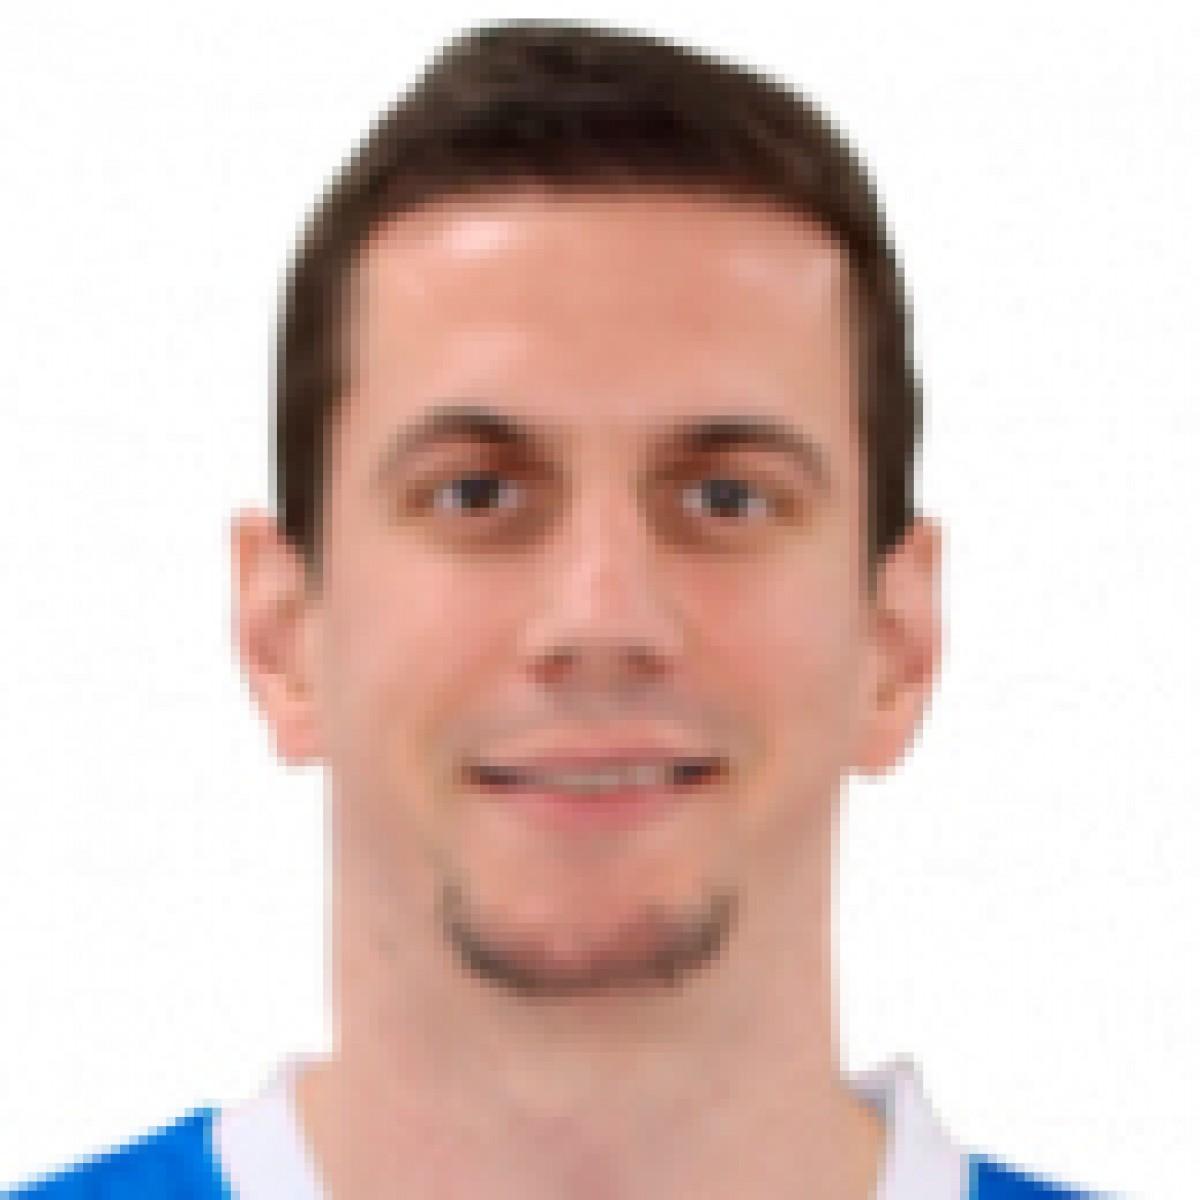 Filip Toncinic